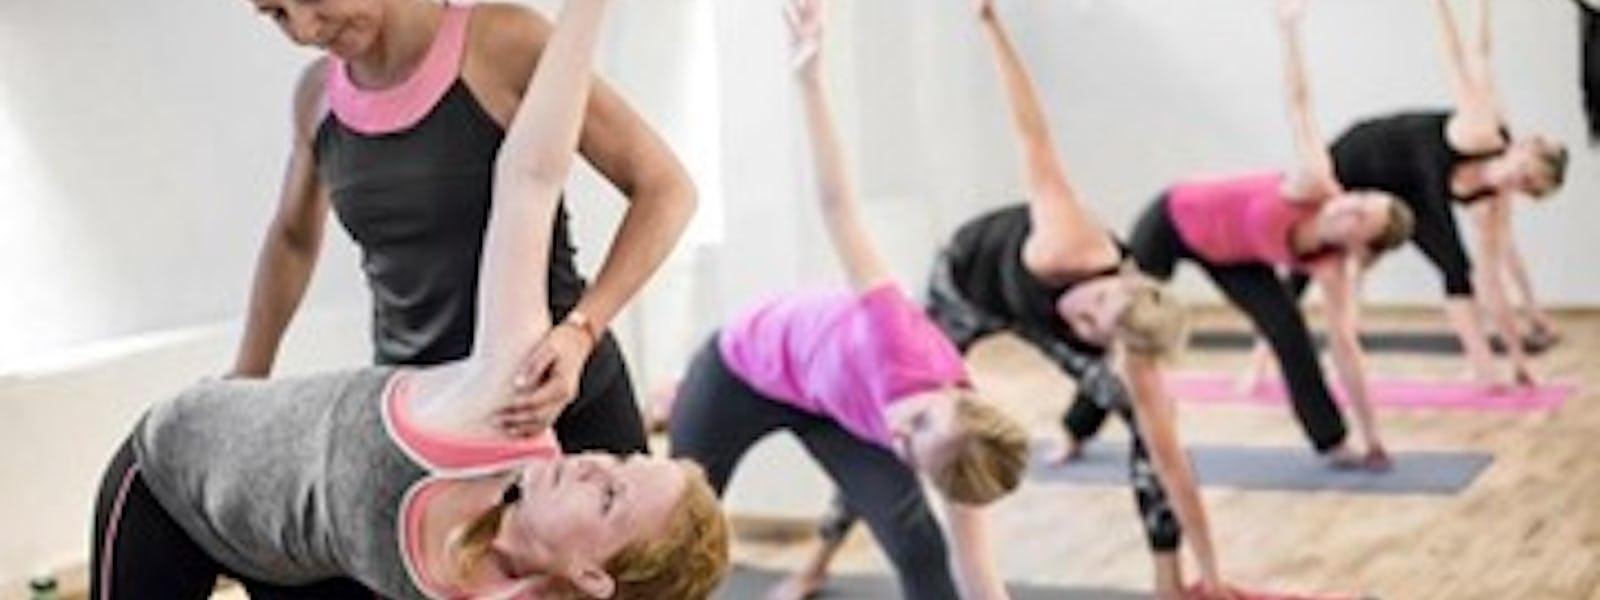 Bild - Introduktion - Ashtanga yoga